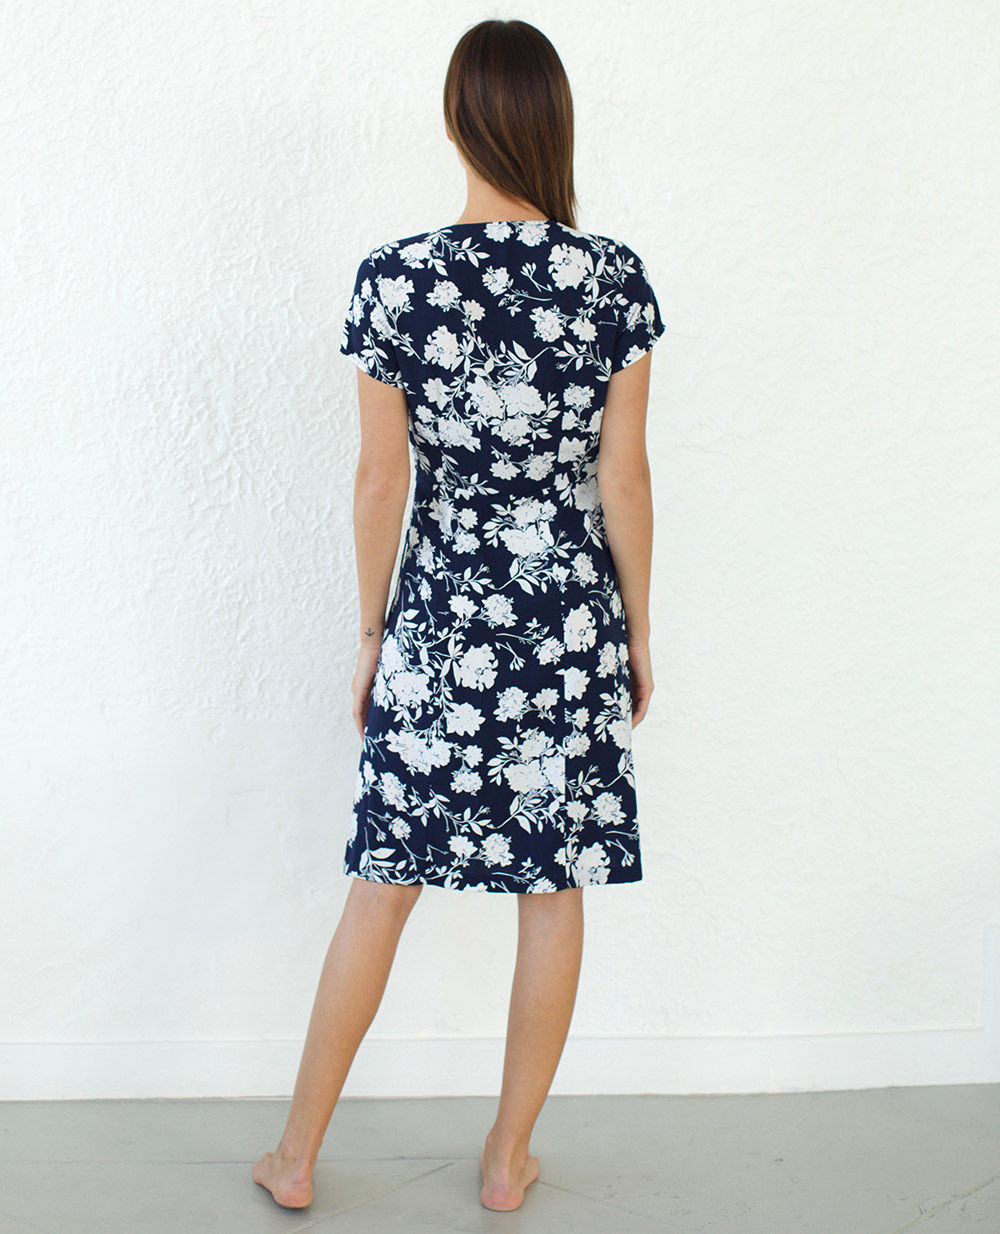 TheClothespinn.com Daisy Dress Hamptons Print